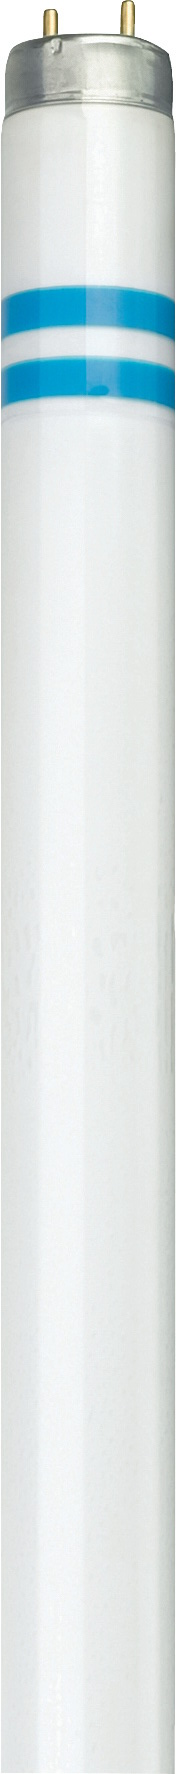 1 Stk TL-D Secura 36W/840 G13 Leuchtstoffröhre Neutralweiß LI82614740